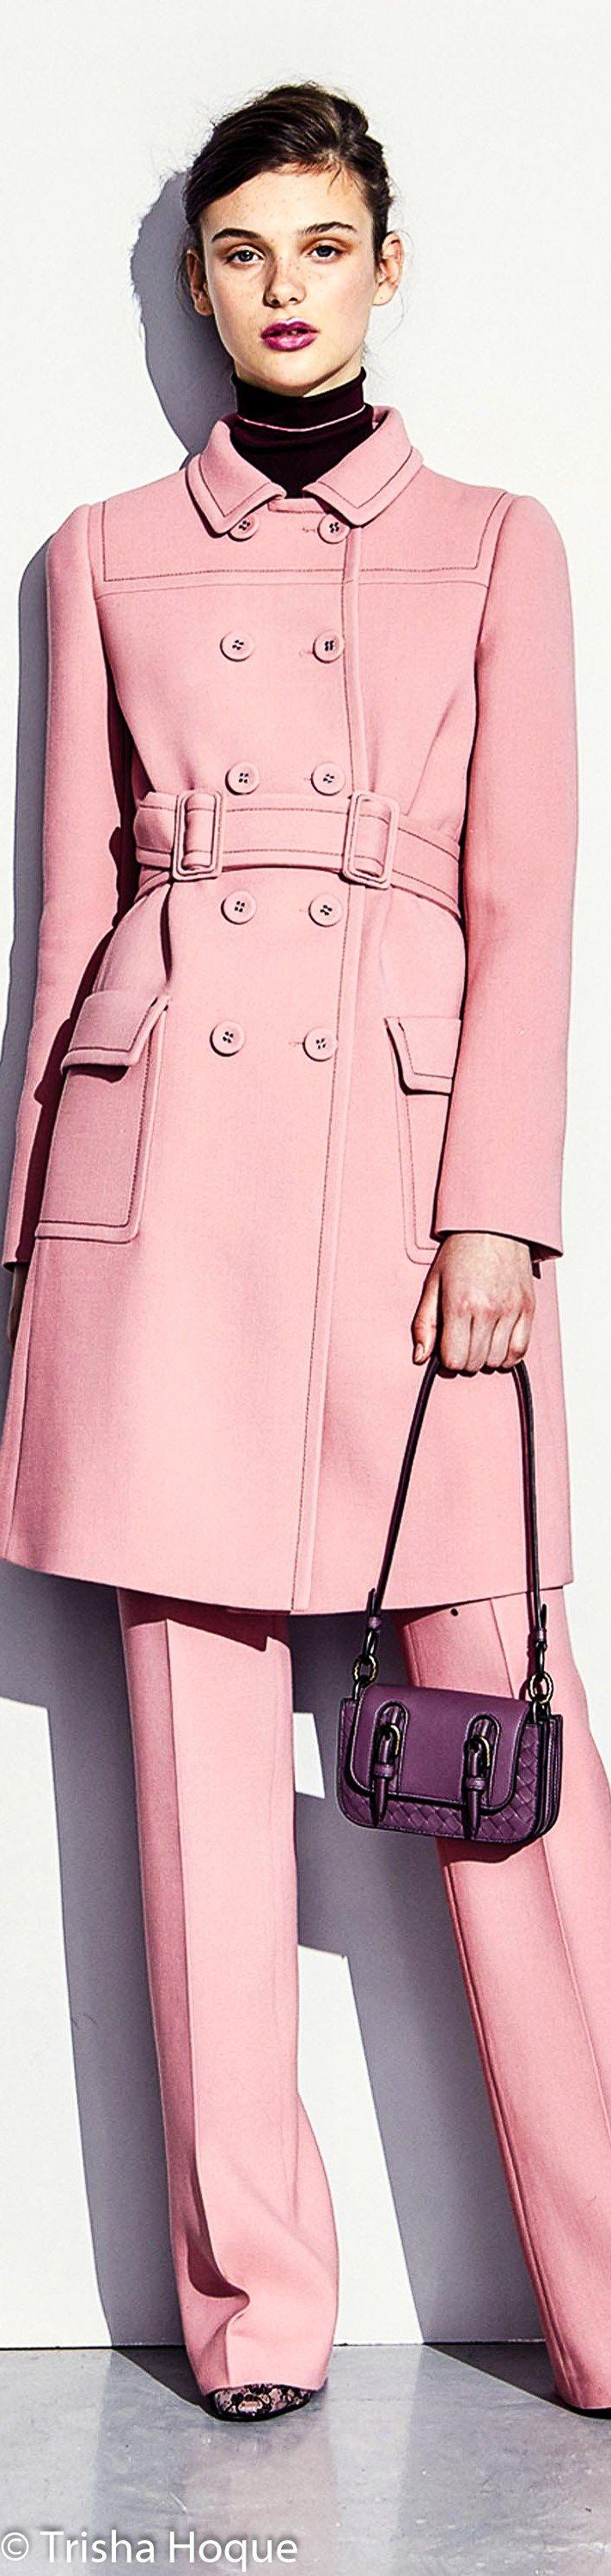 Bottega-Veneta-Pre-fall-2017-Outfit-8.jpg